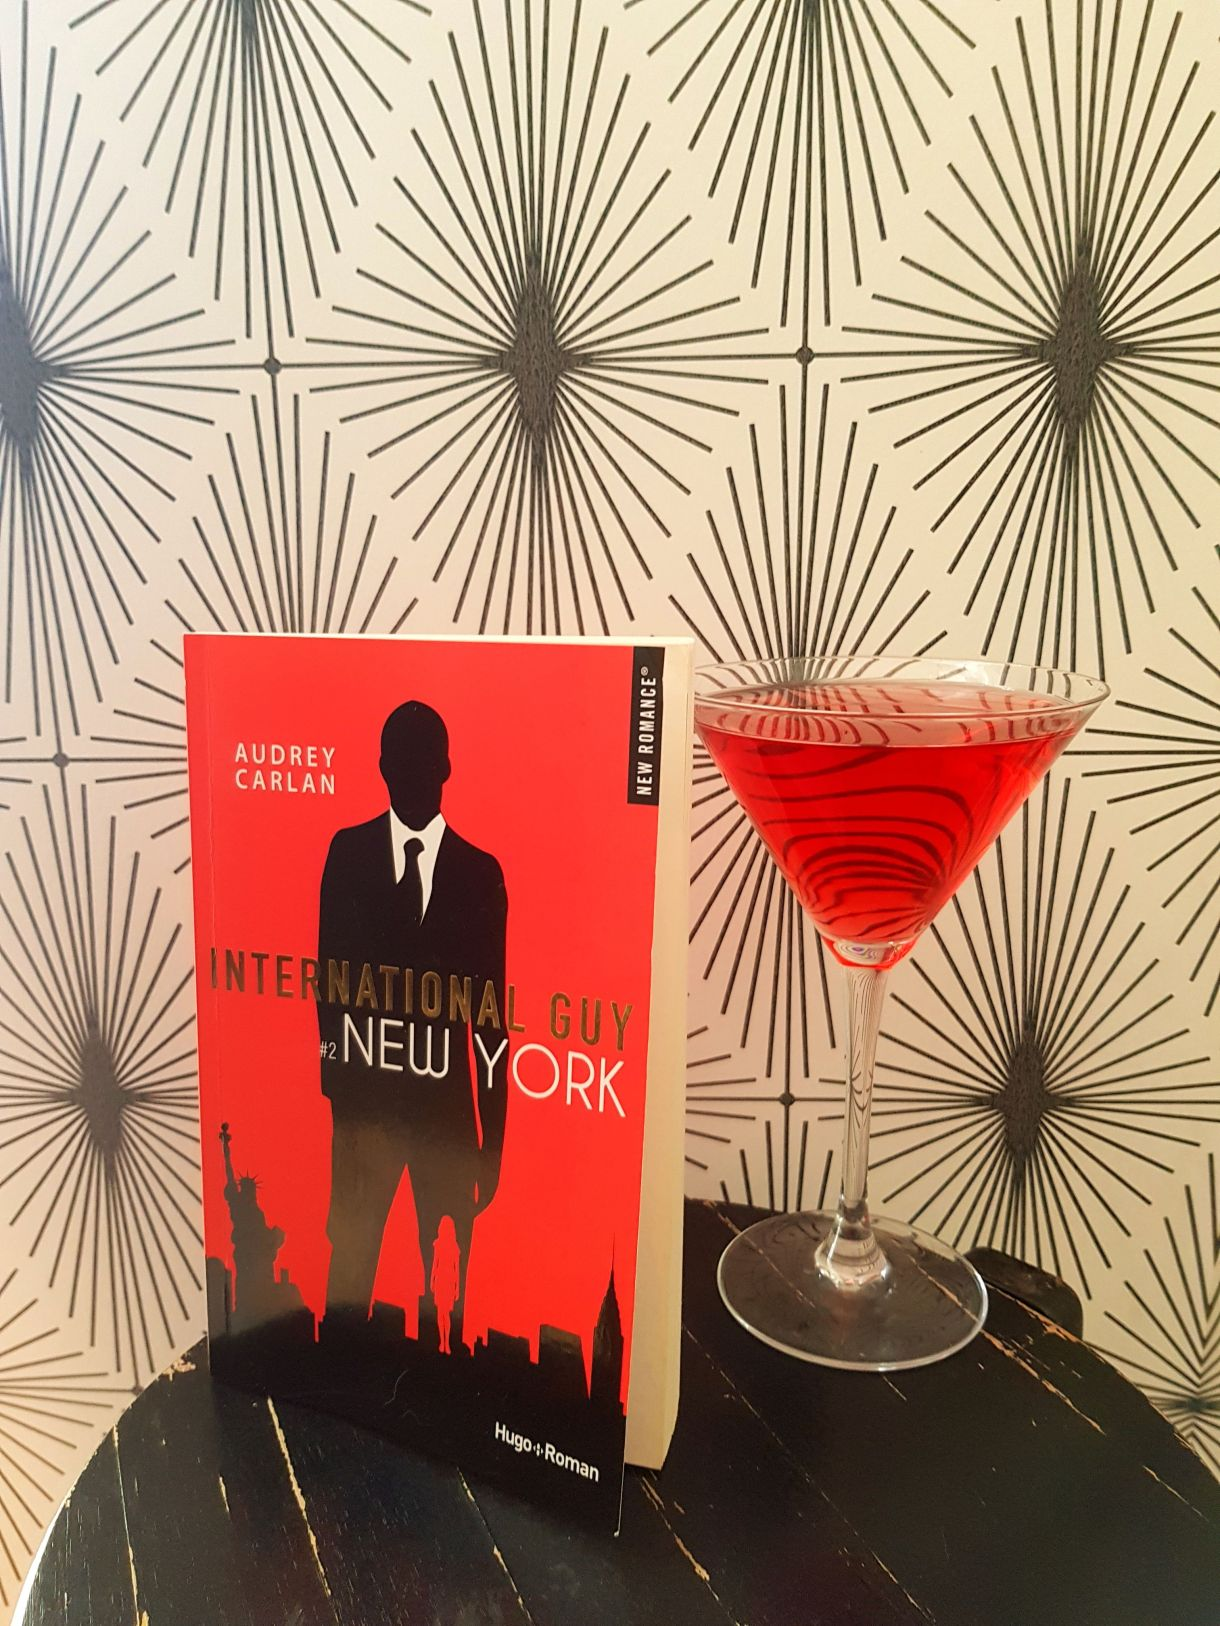 International Guy, Tome 2 – New York de Audrey Carlan